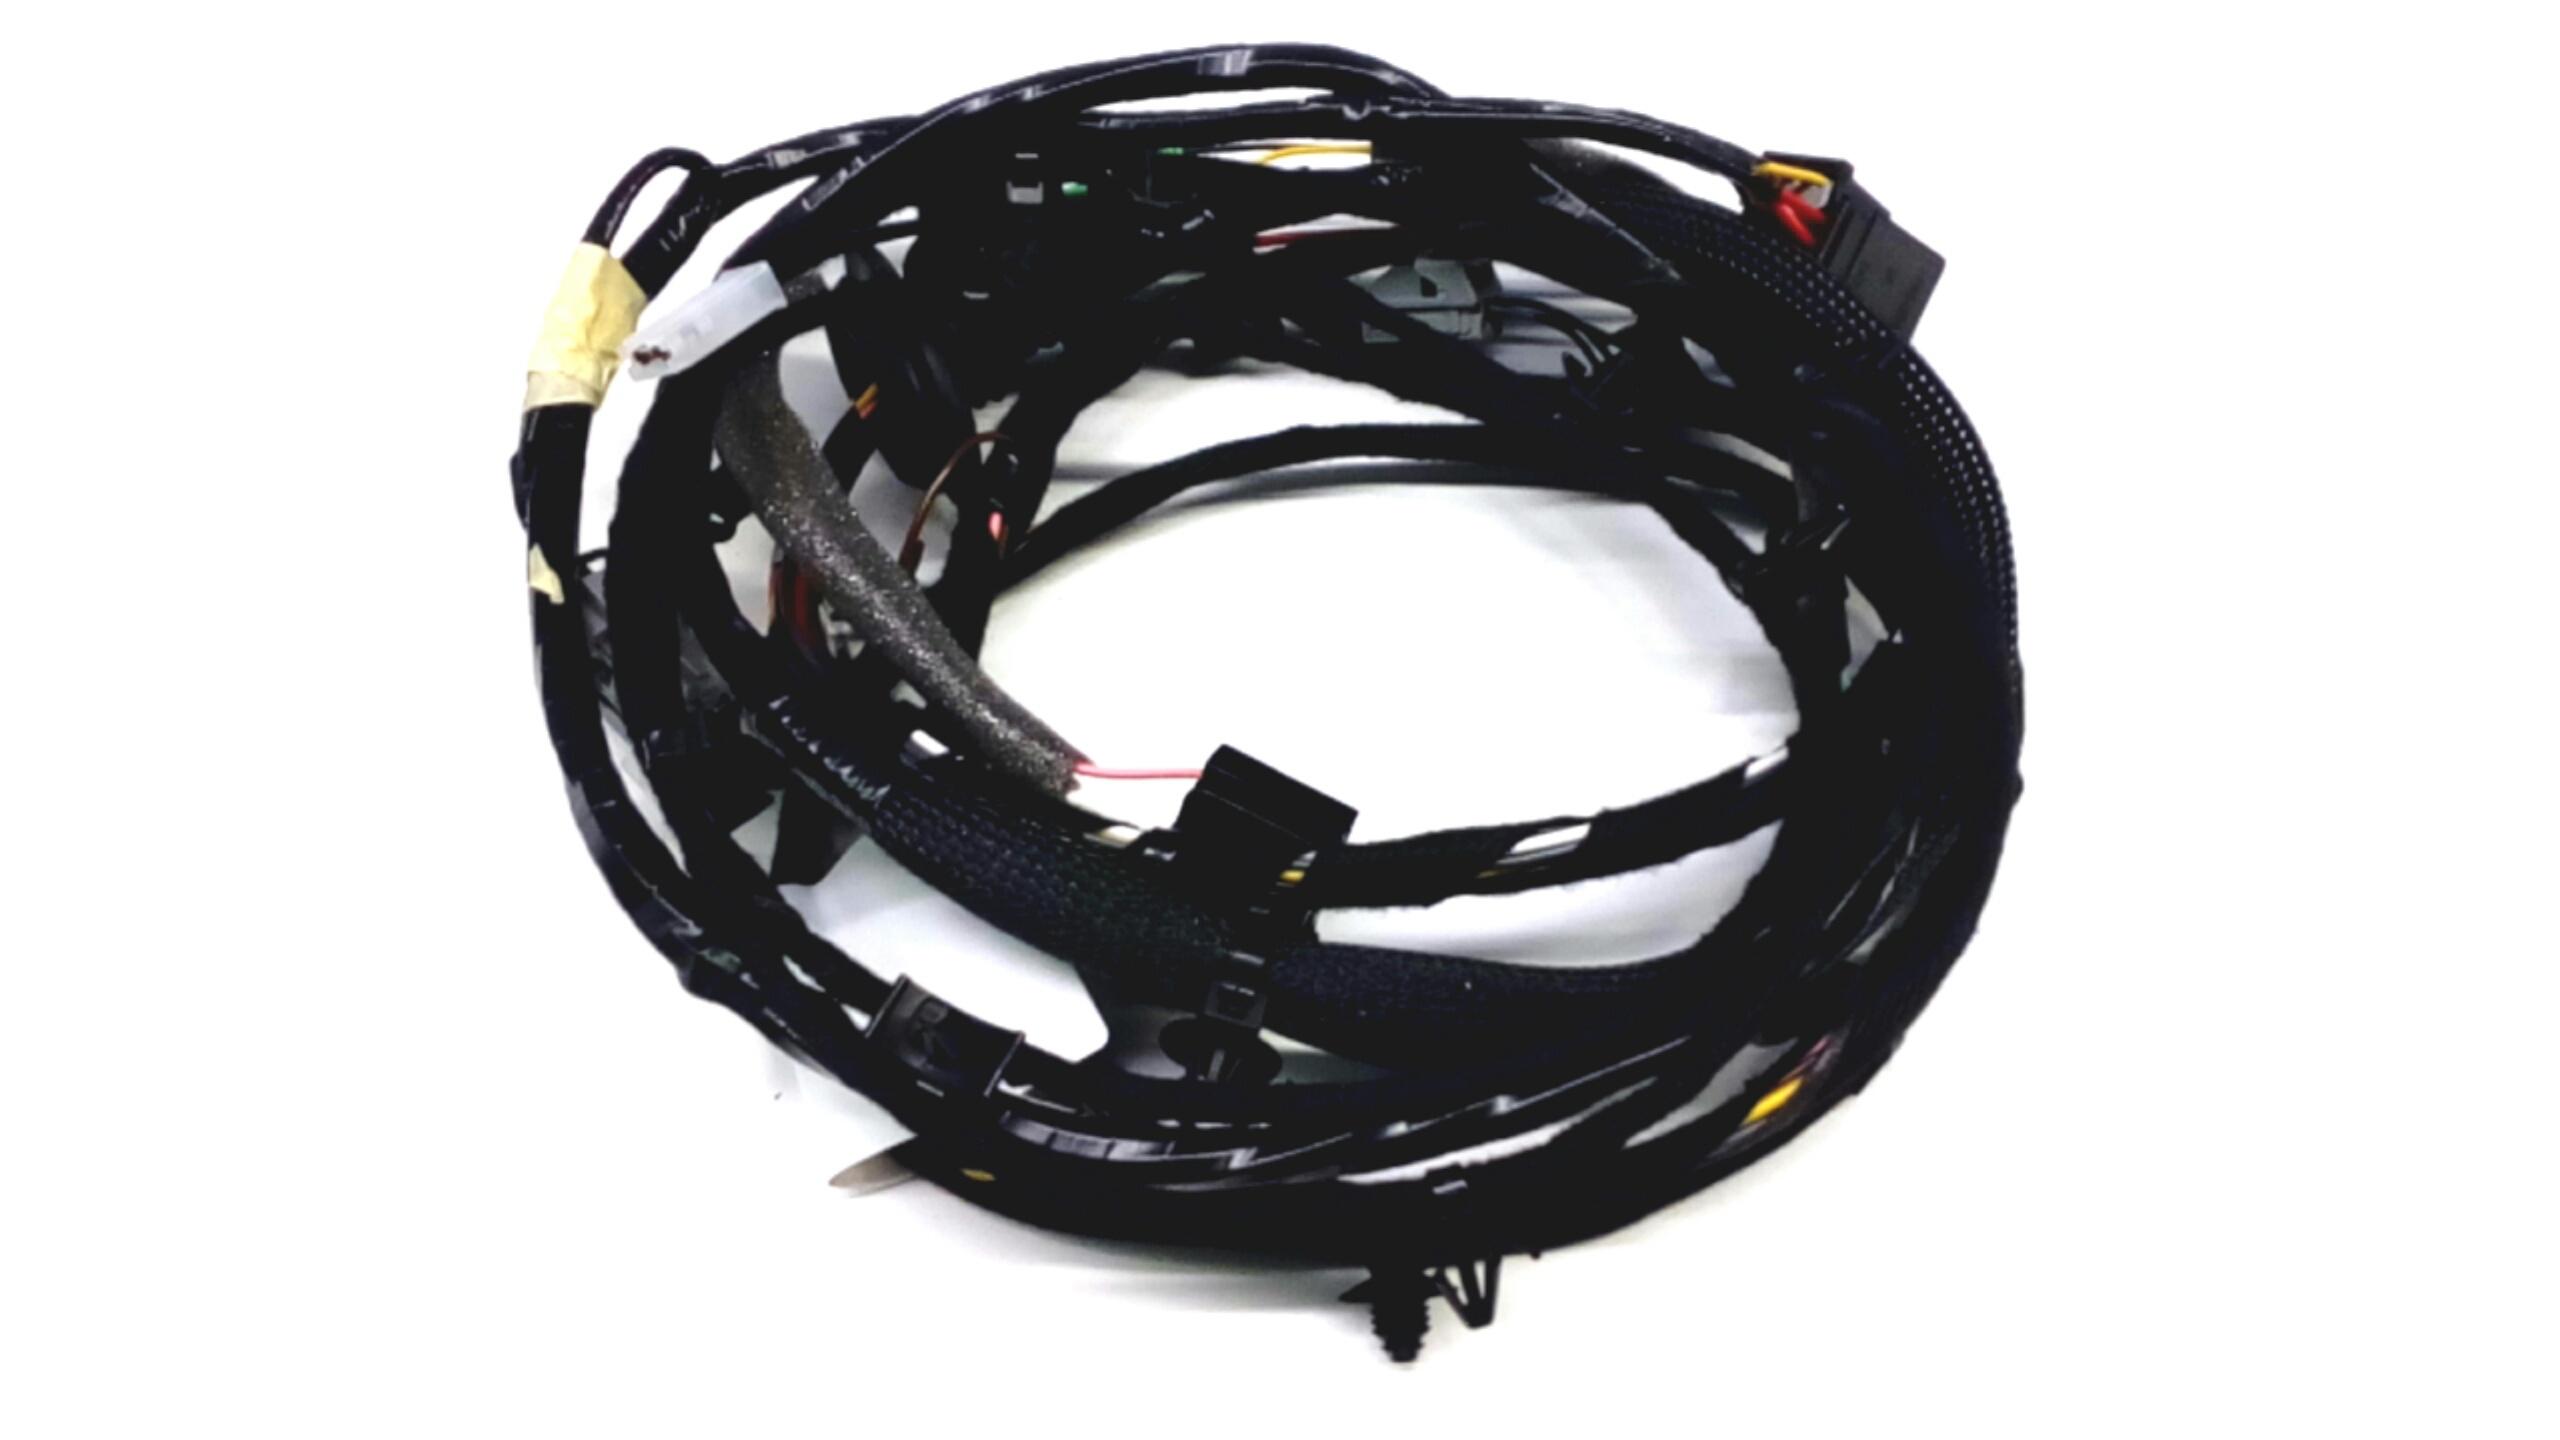 volvo v70 wiring harness - 8697924 | volvo parts webstore ... volvo v70 tailgate wiring harness #12